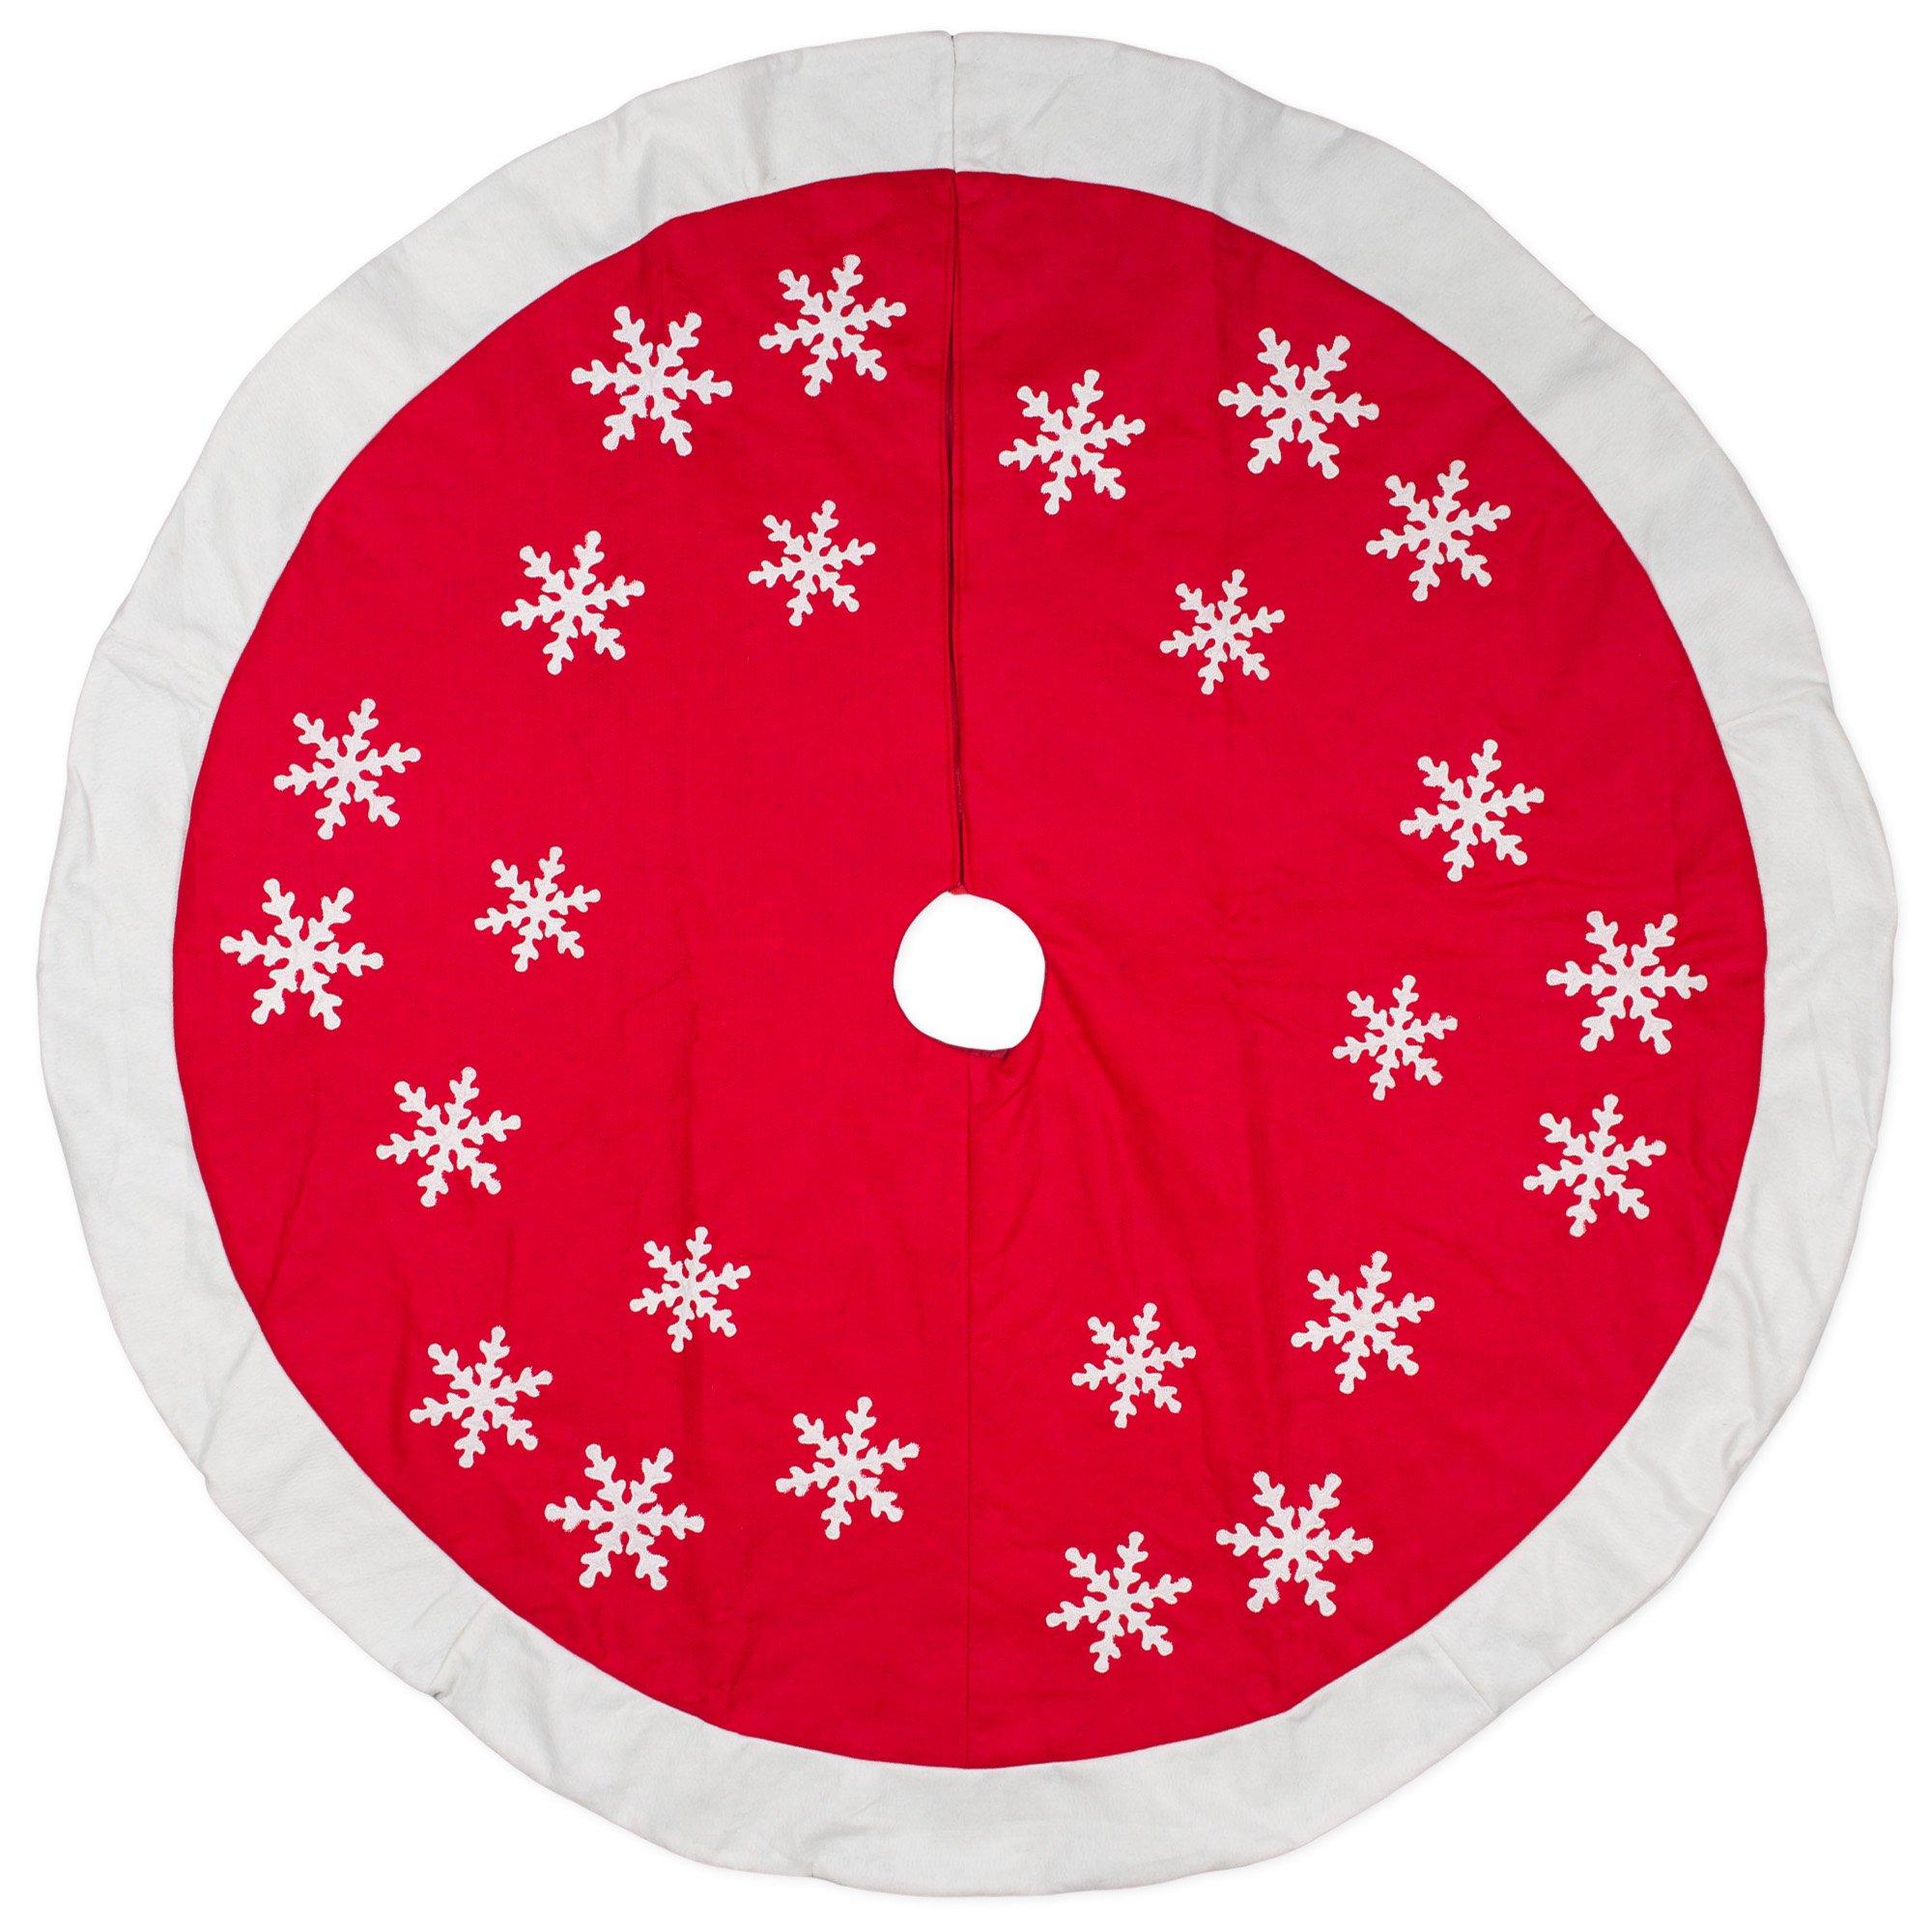 56 inch Red White Snowflakes Design Wool/Felt Christmas Tree Skirt